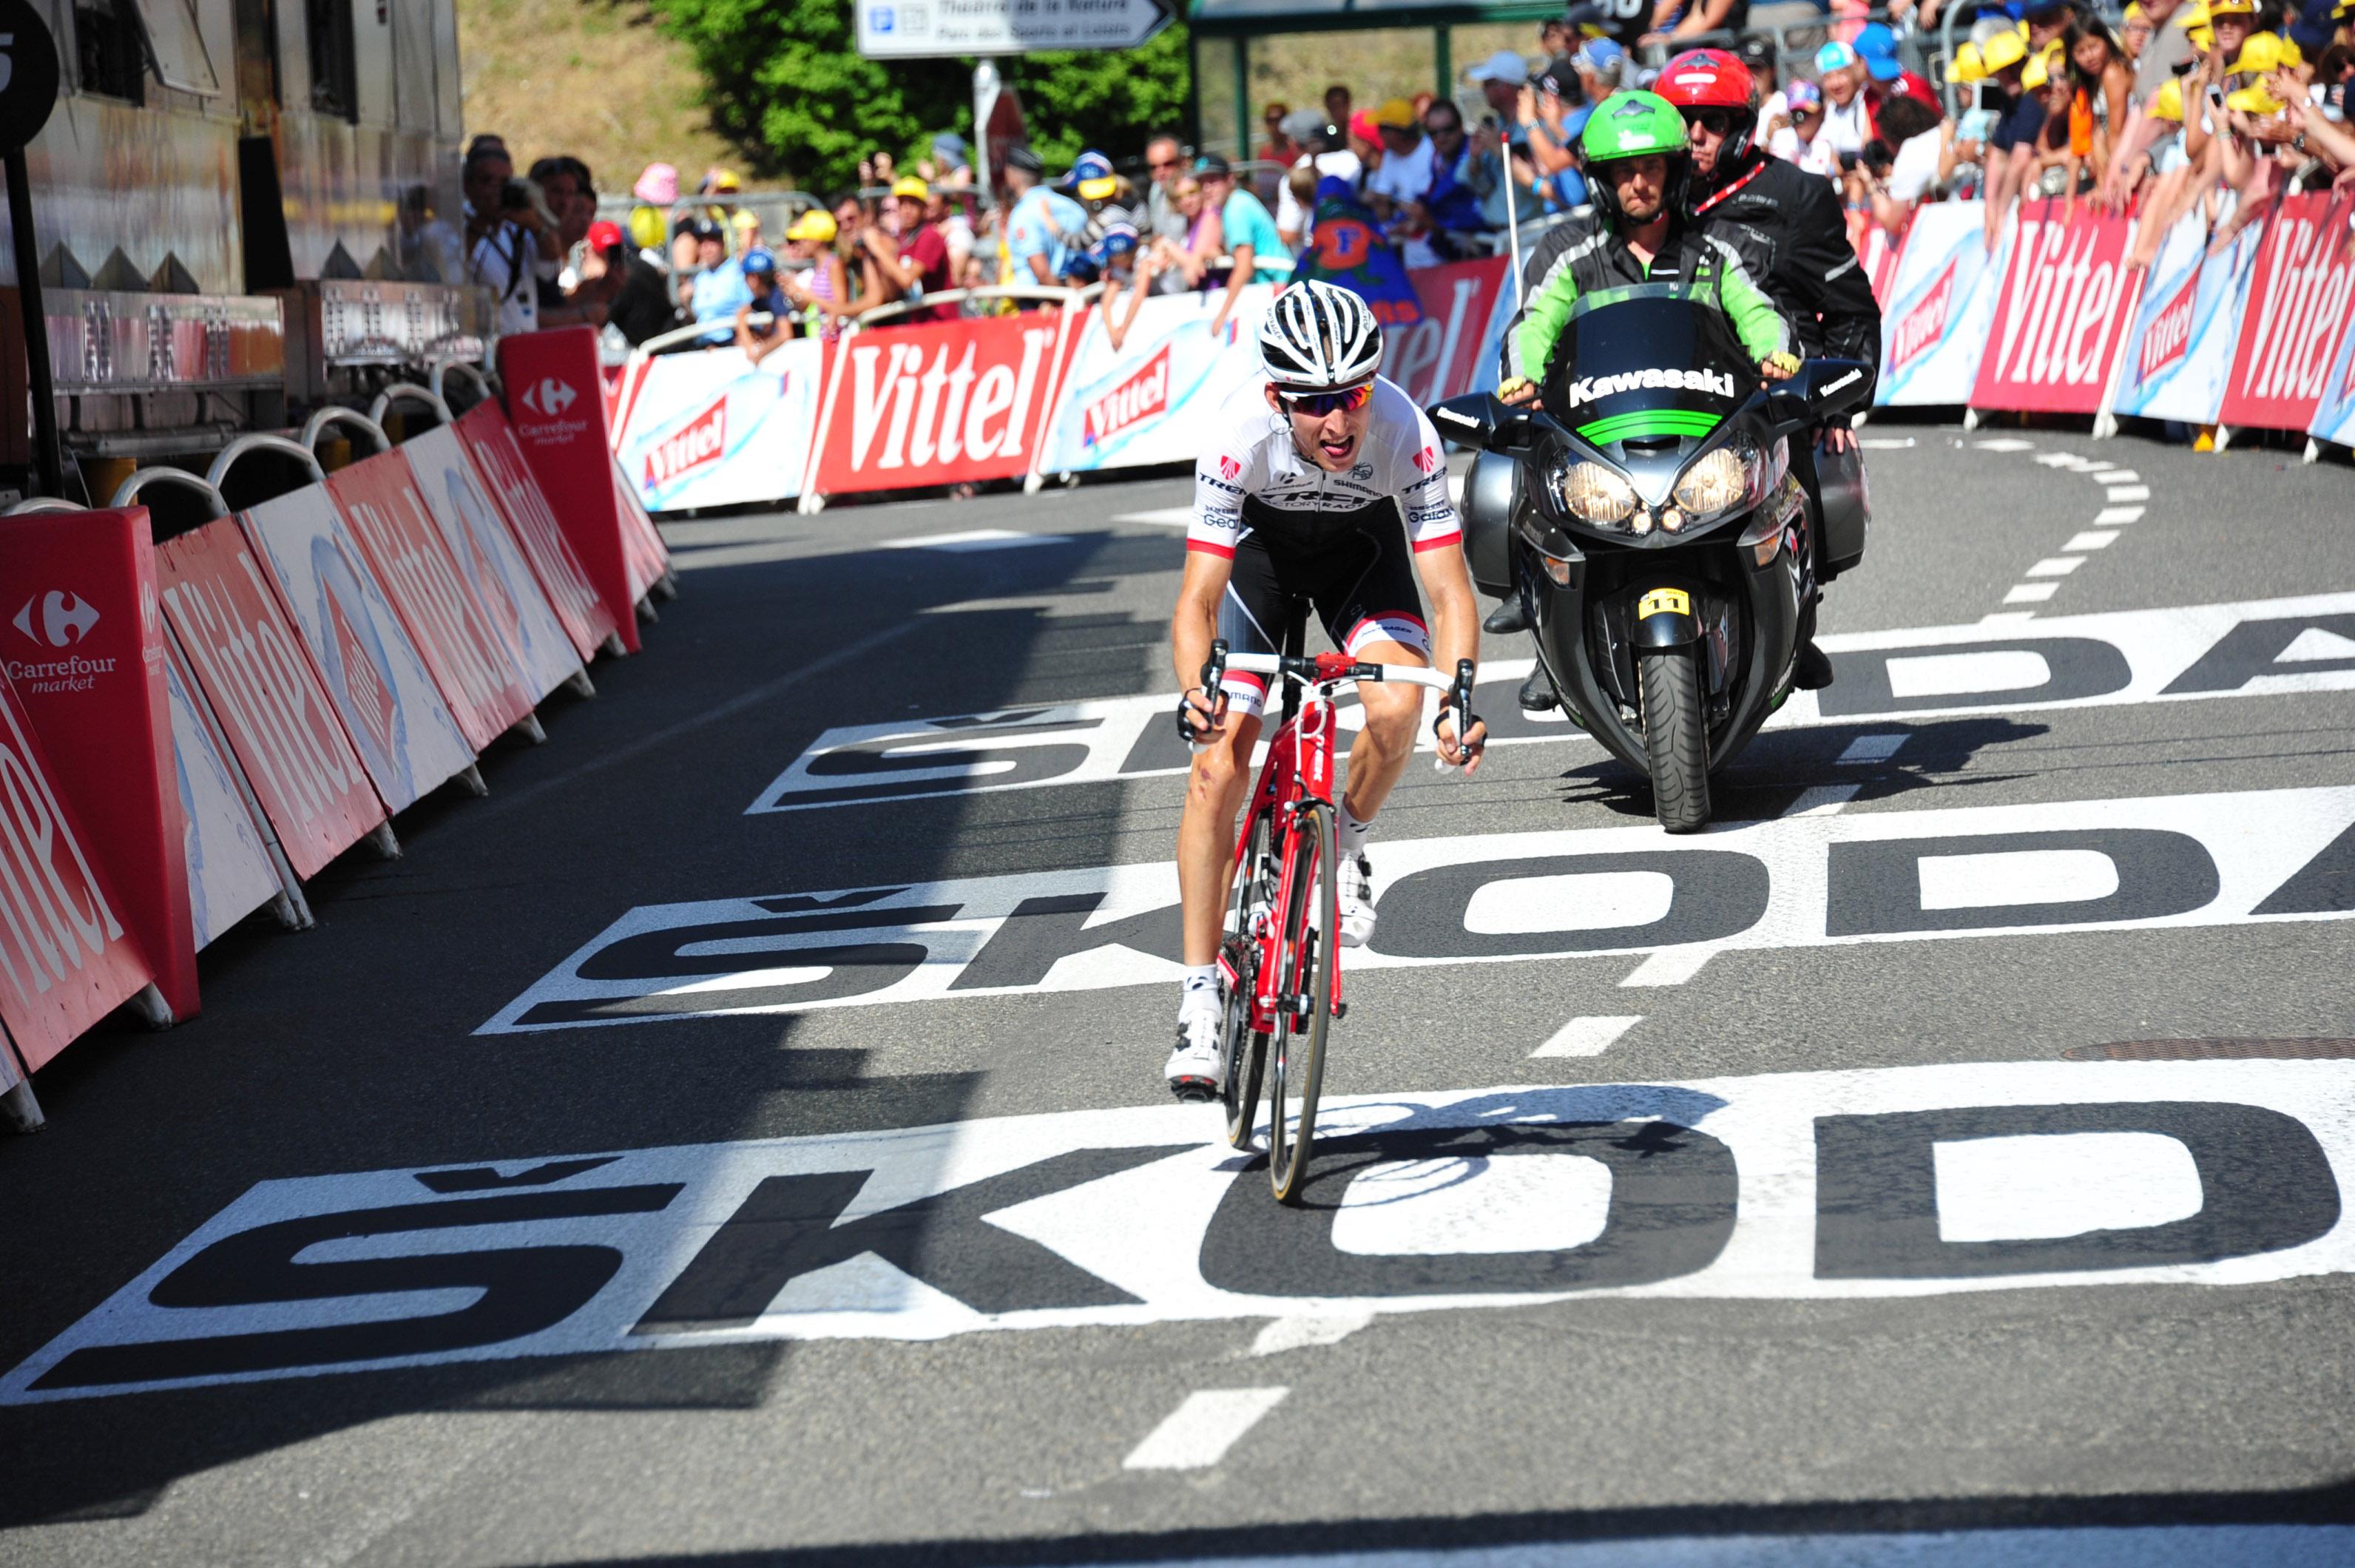 Tour de France 2015 - 11. Etappe - Pyrenäen - Bauke Mollema